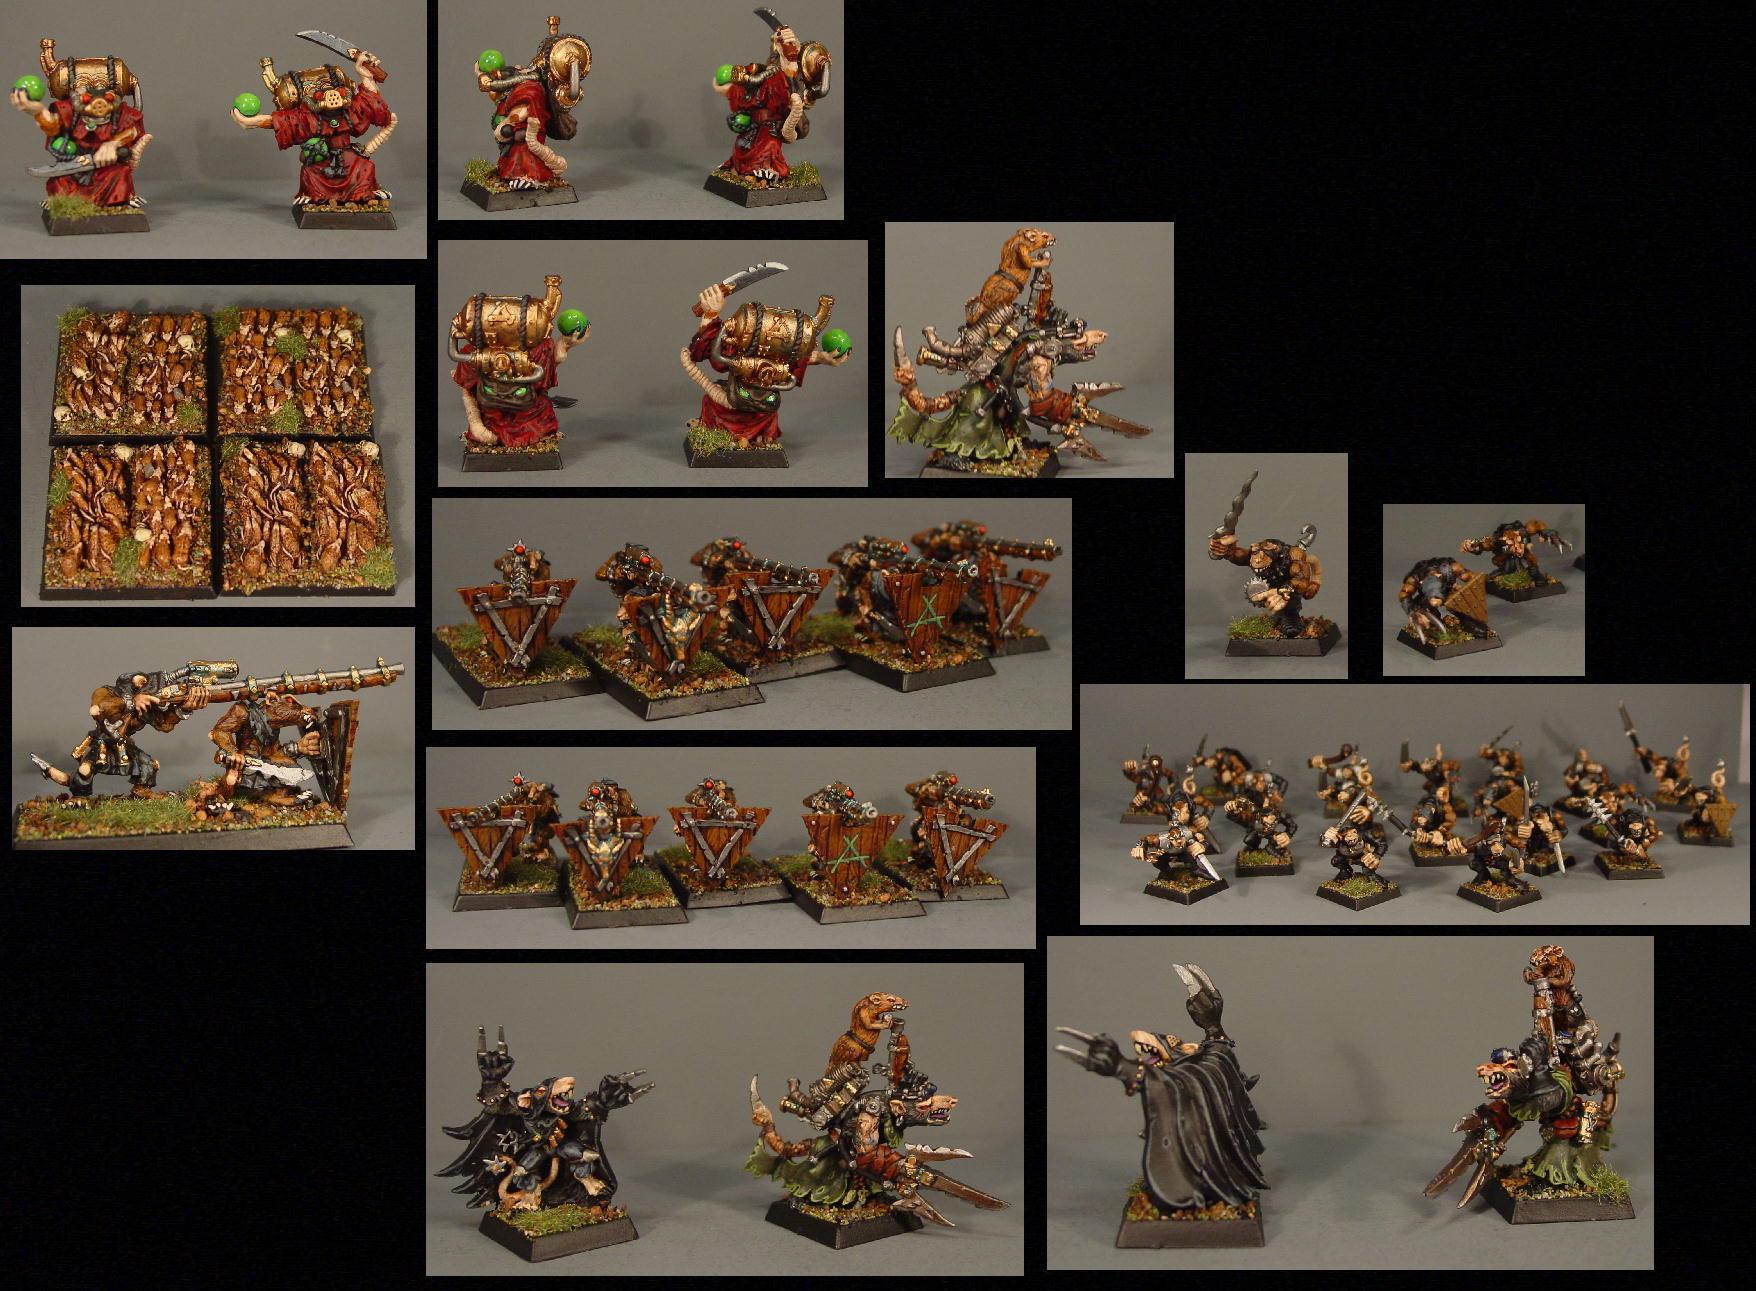 Army, Pro Painted, Rpg, Skaven, Warhammer Fantasy